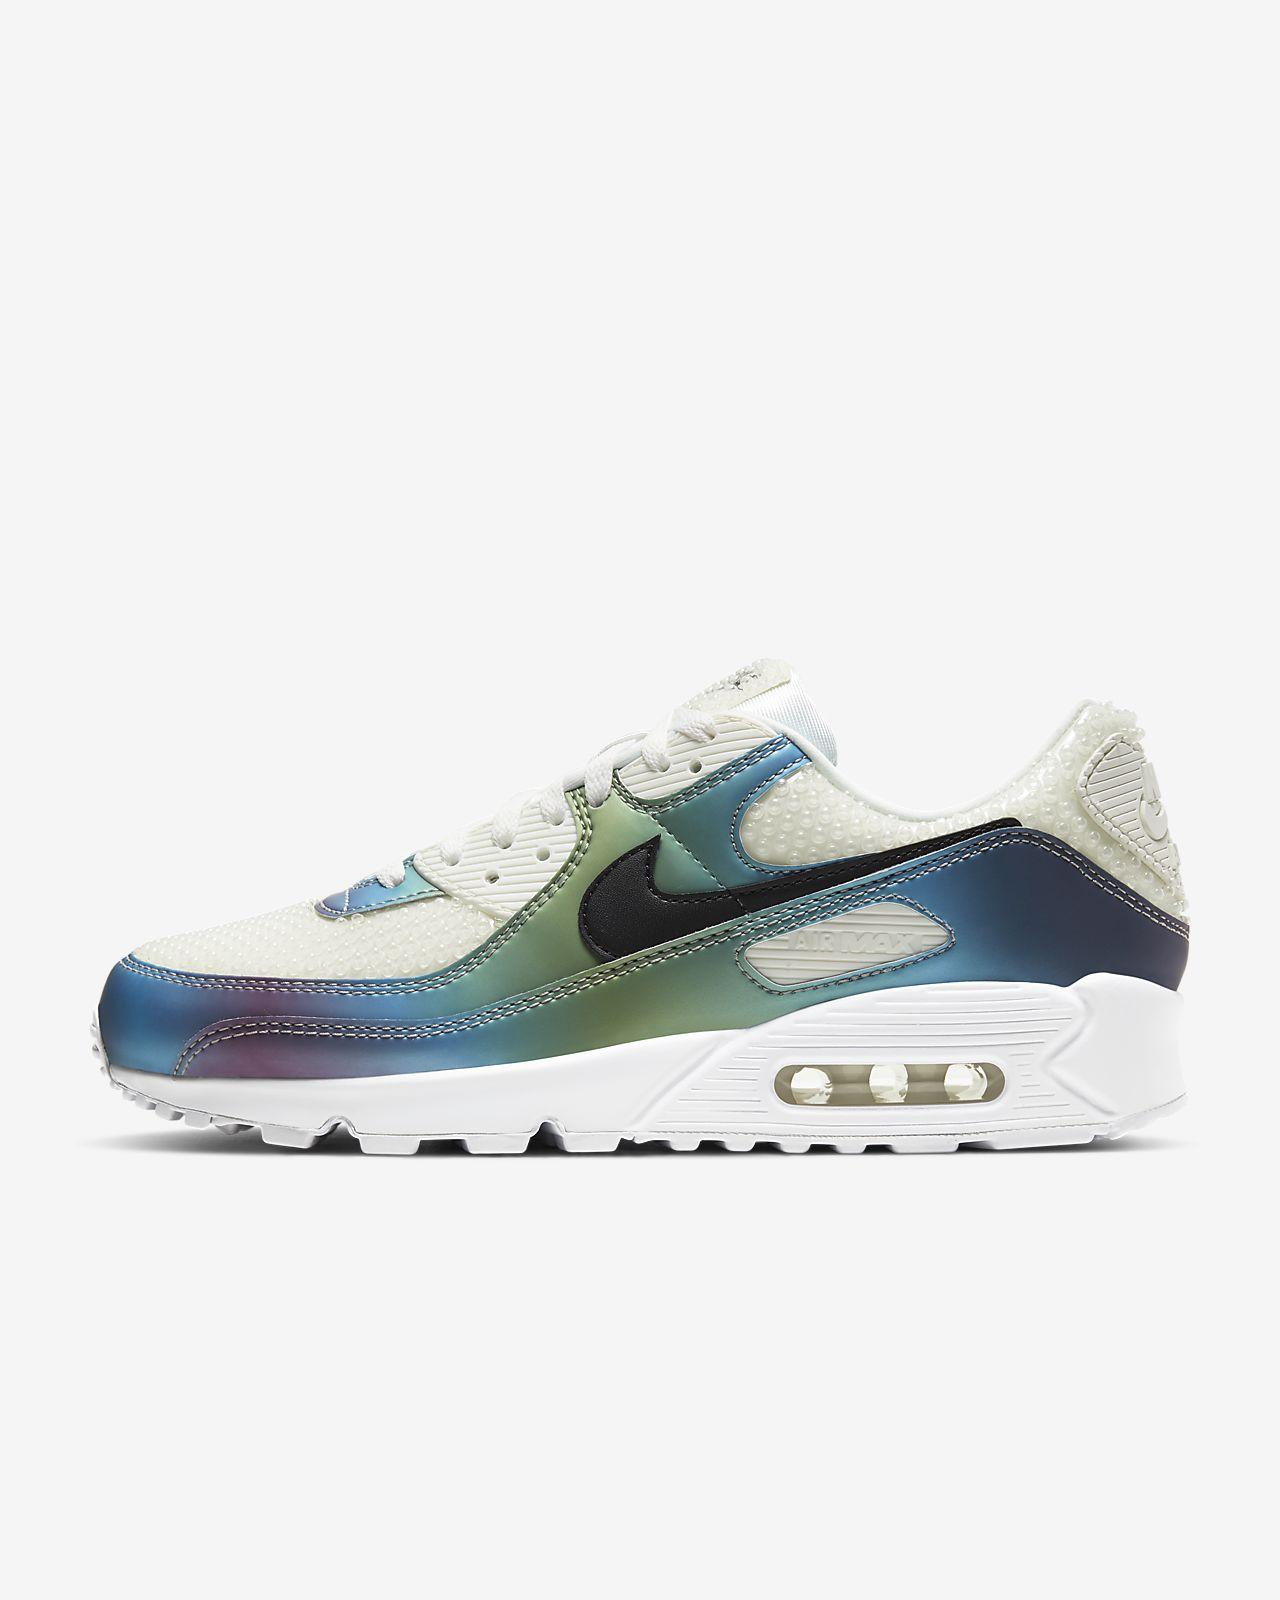 nike air max 90 shoes mens